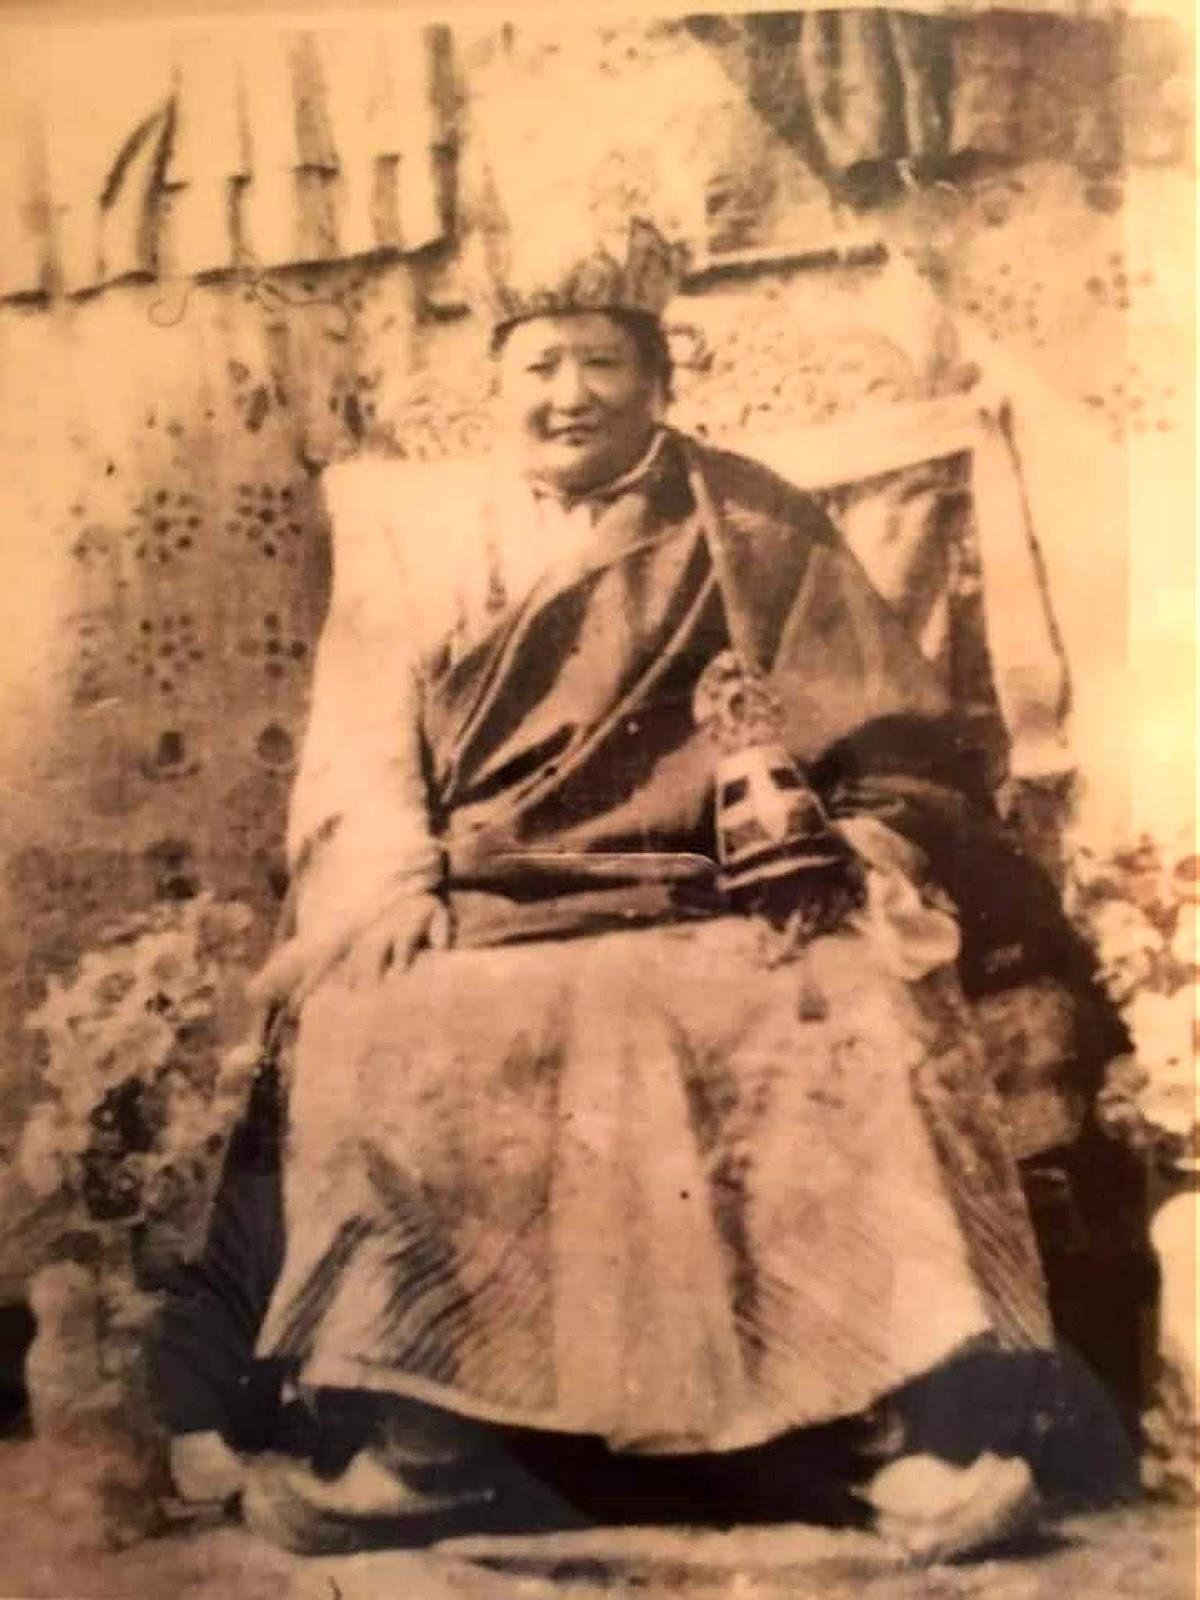 SAKYA KUN KHIAB CHO LING desde 1995: ANIVERSÁRIO DE NGAWANG